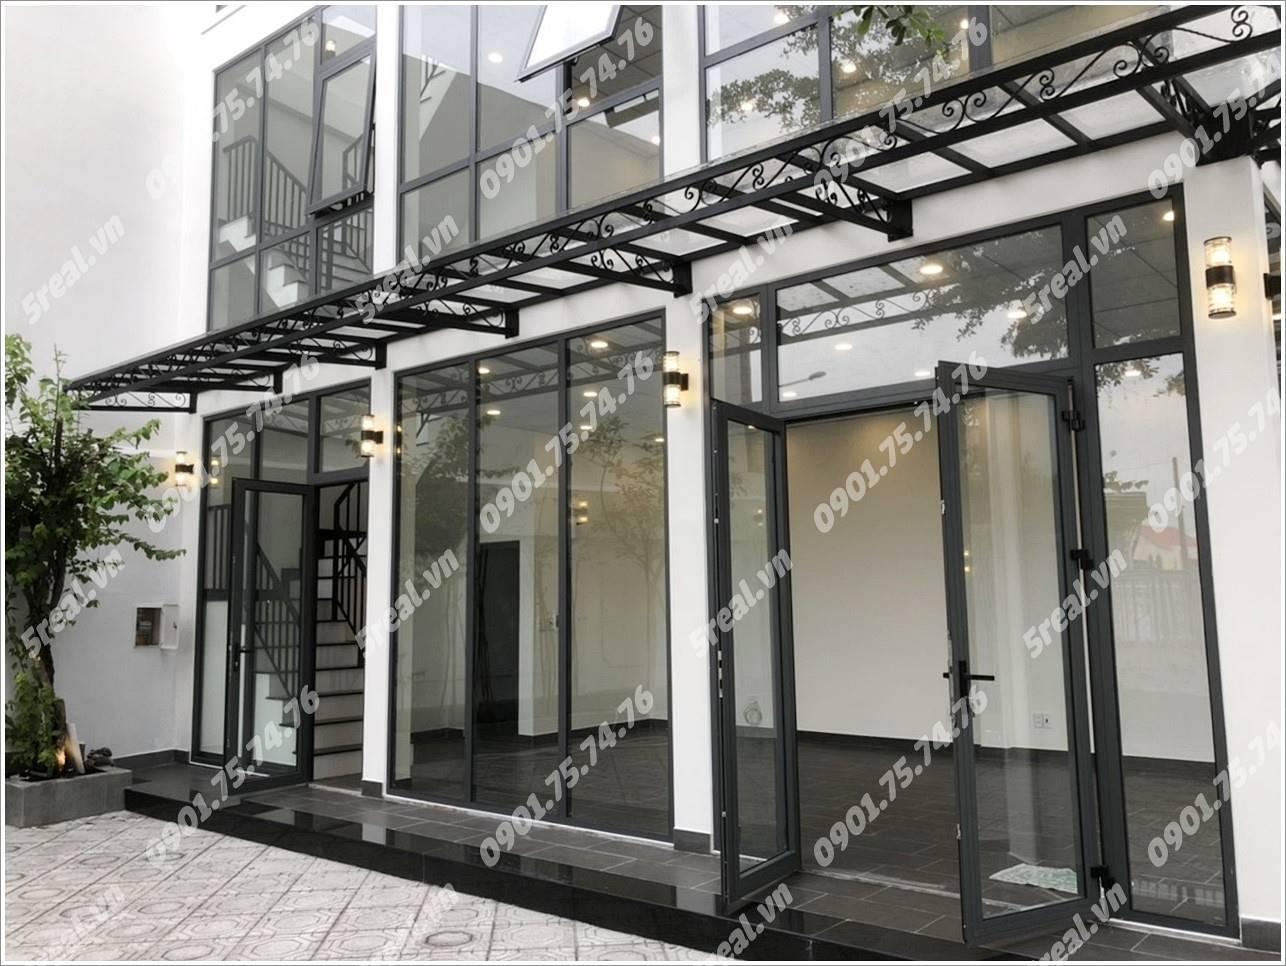 song-hanh-22-building-huyen-hoc-mon-van-phong-cho-thue-tphcm-5real.vn-04